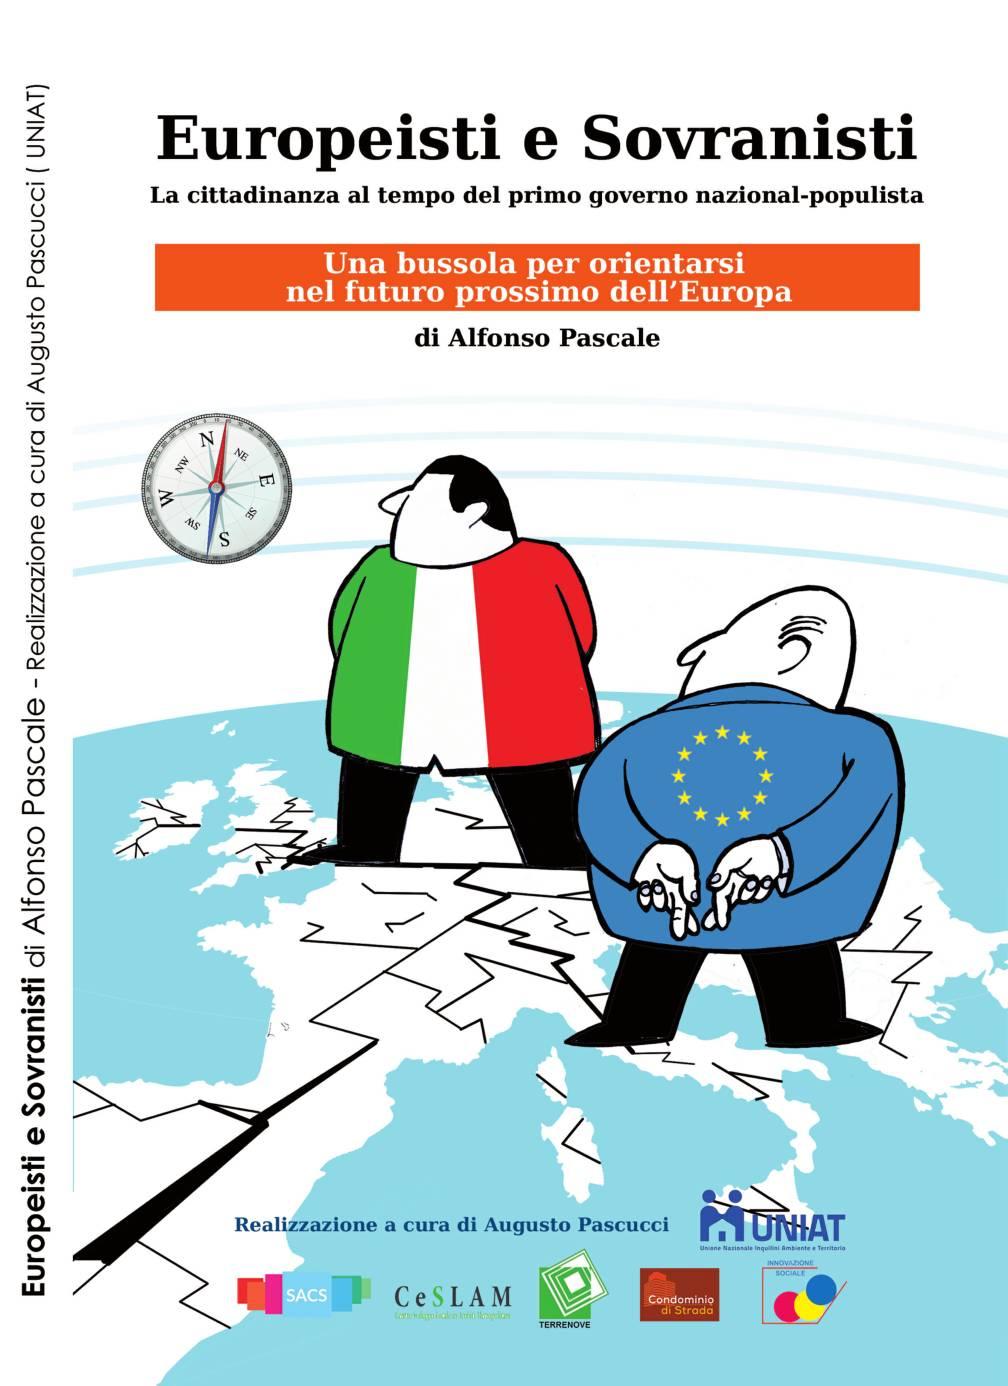 Europeisti e Sovranisti